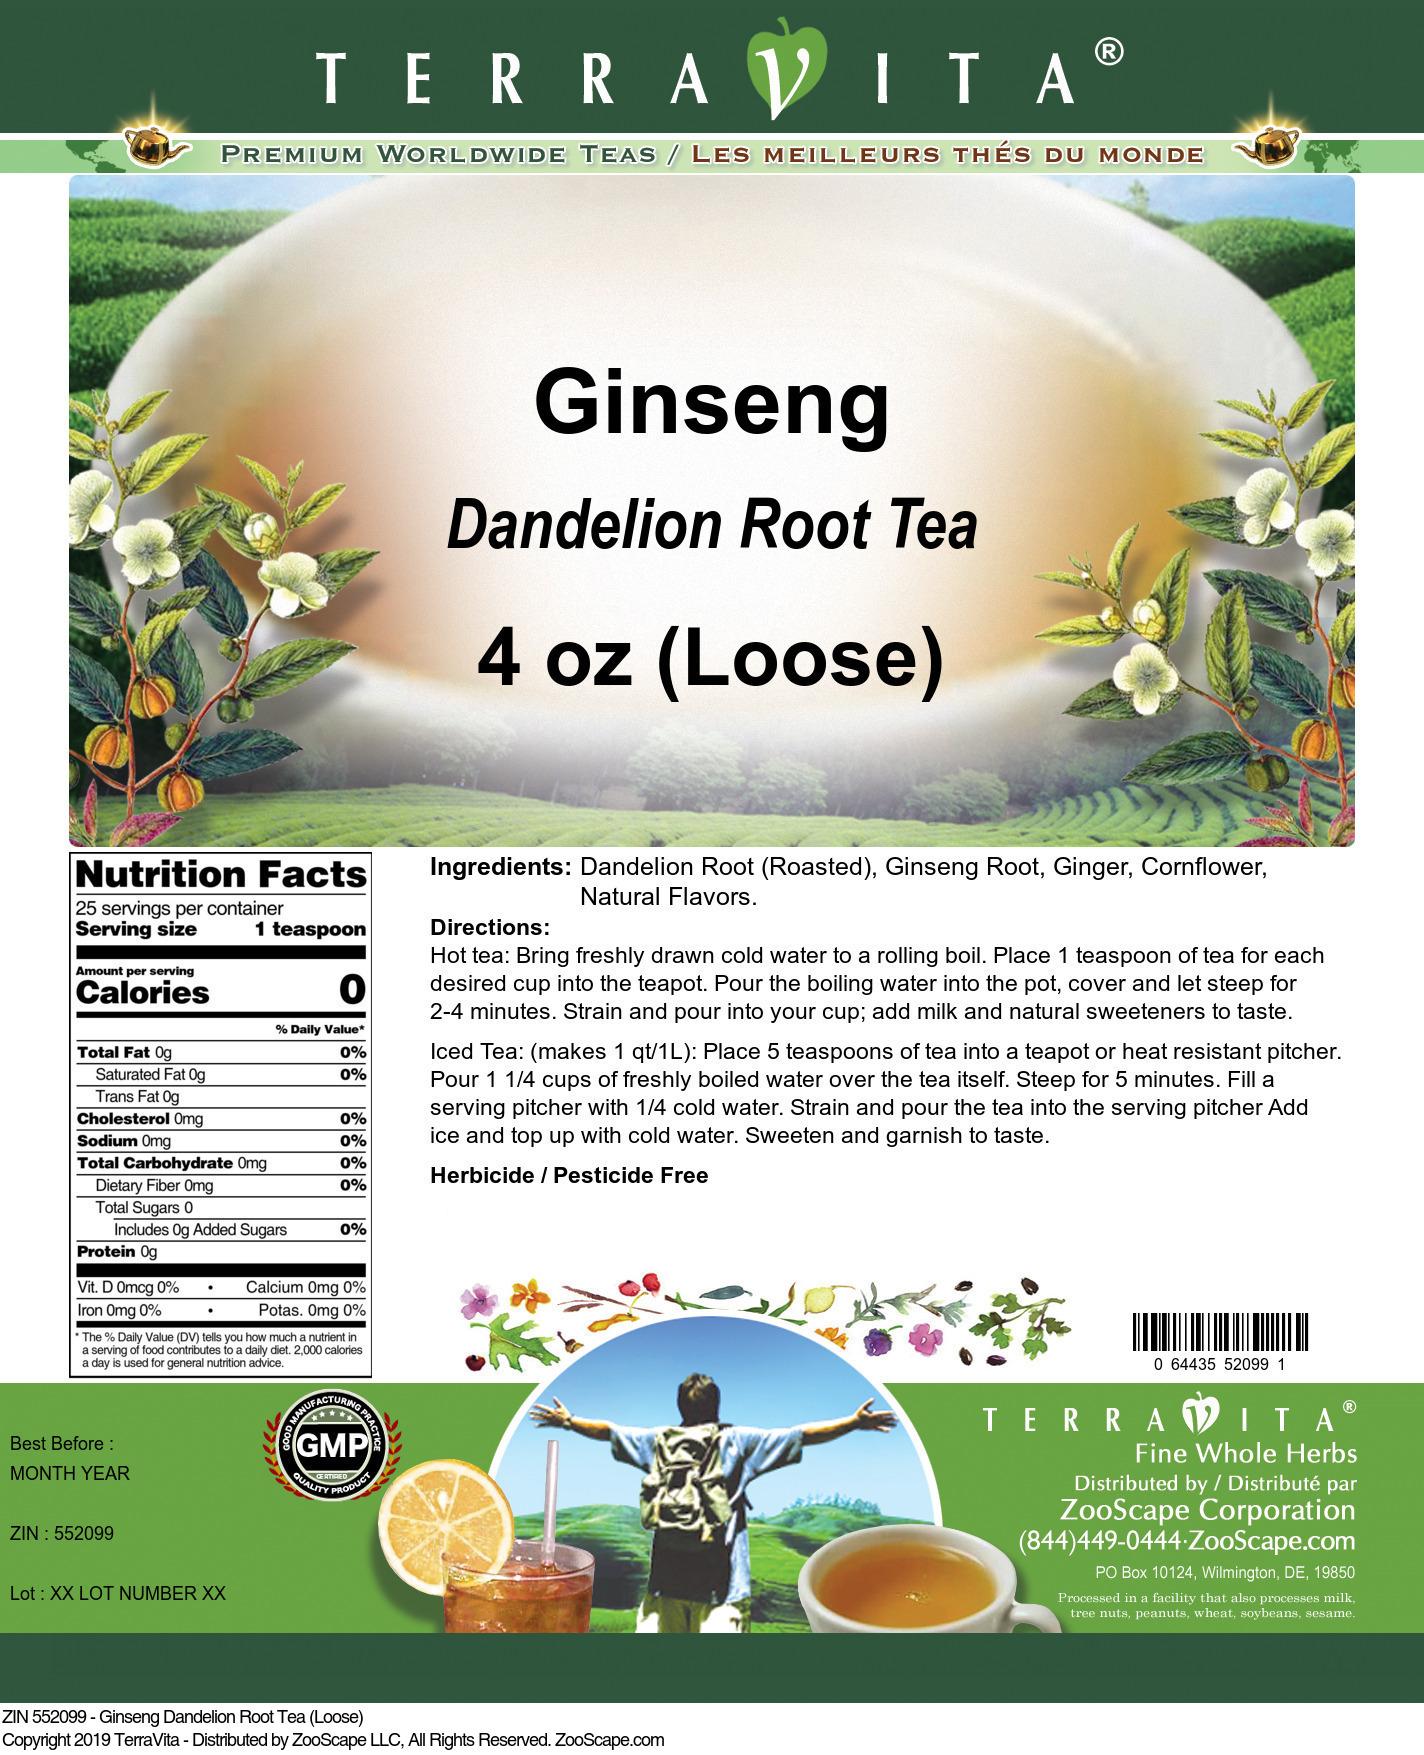 Ginseng Dandelion Root Tea (Loose)